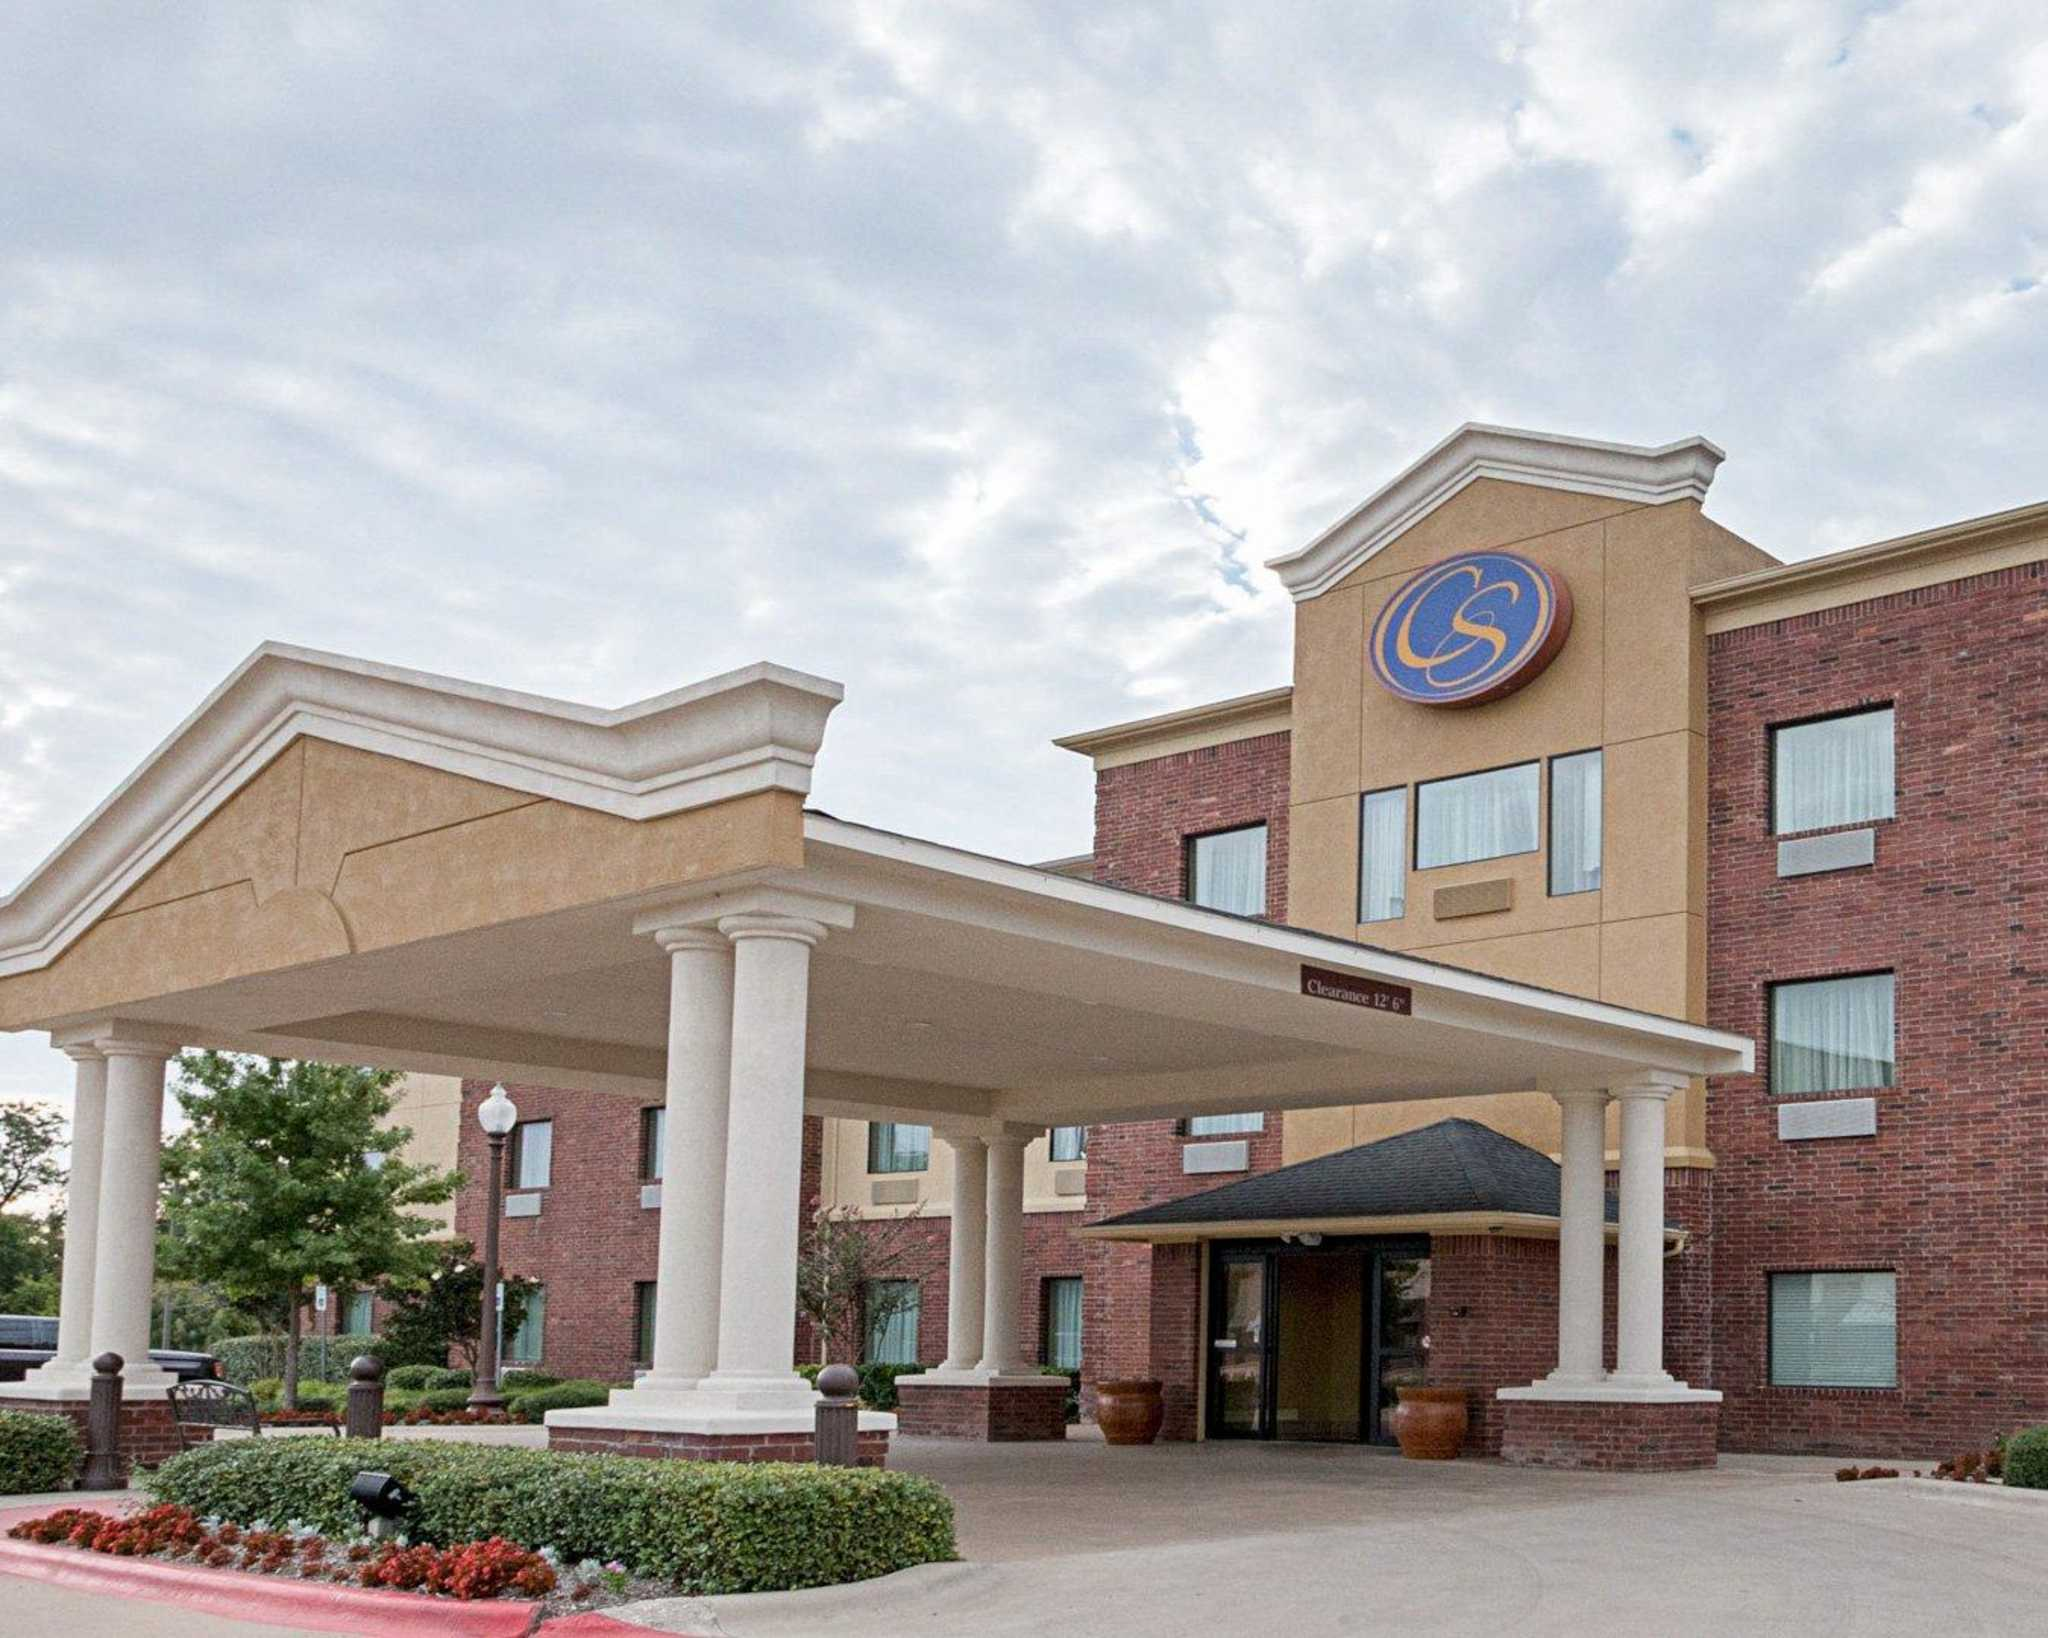 Hotel in TX Ennis 75119 Comfort Suites 400 South I-45  (623)209-7618